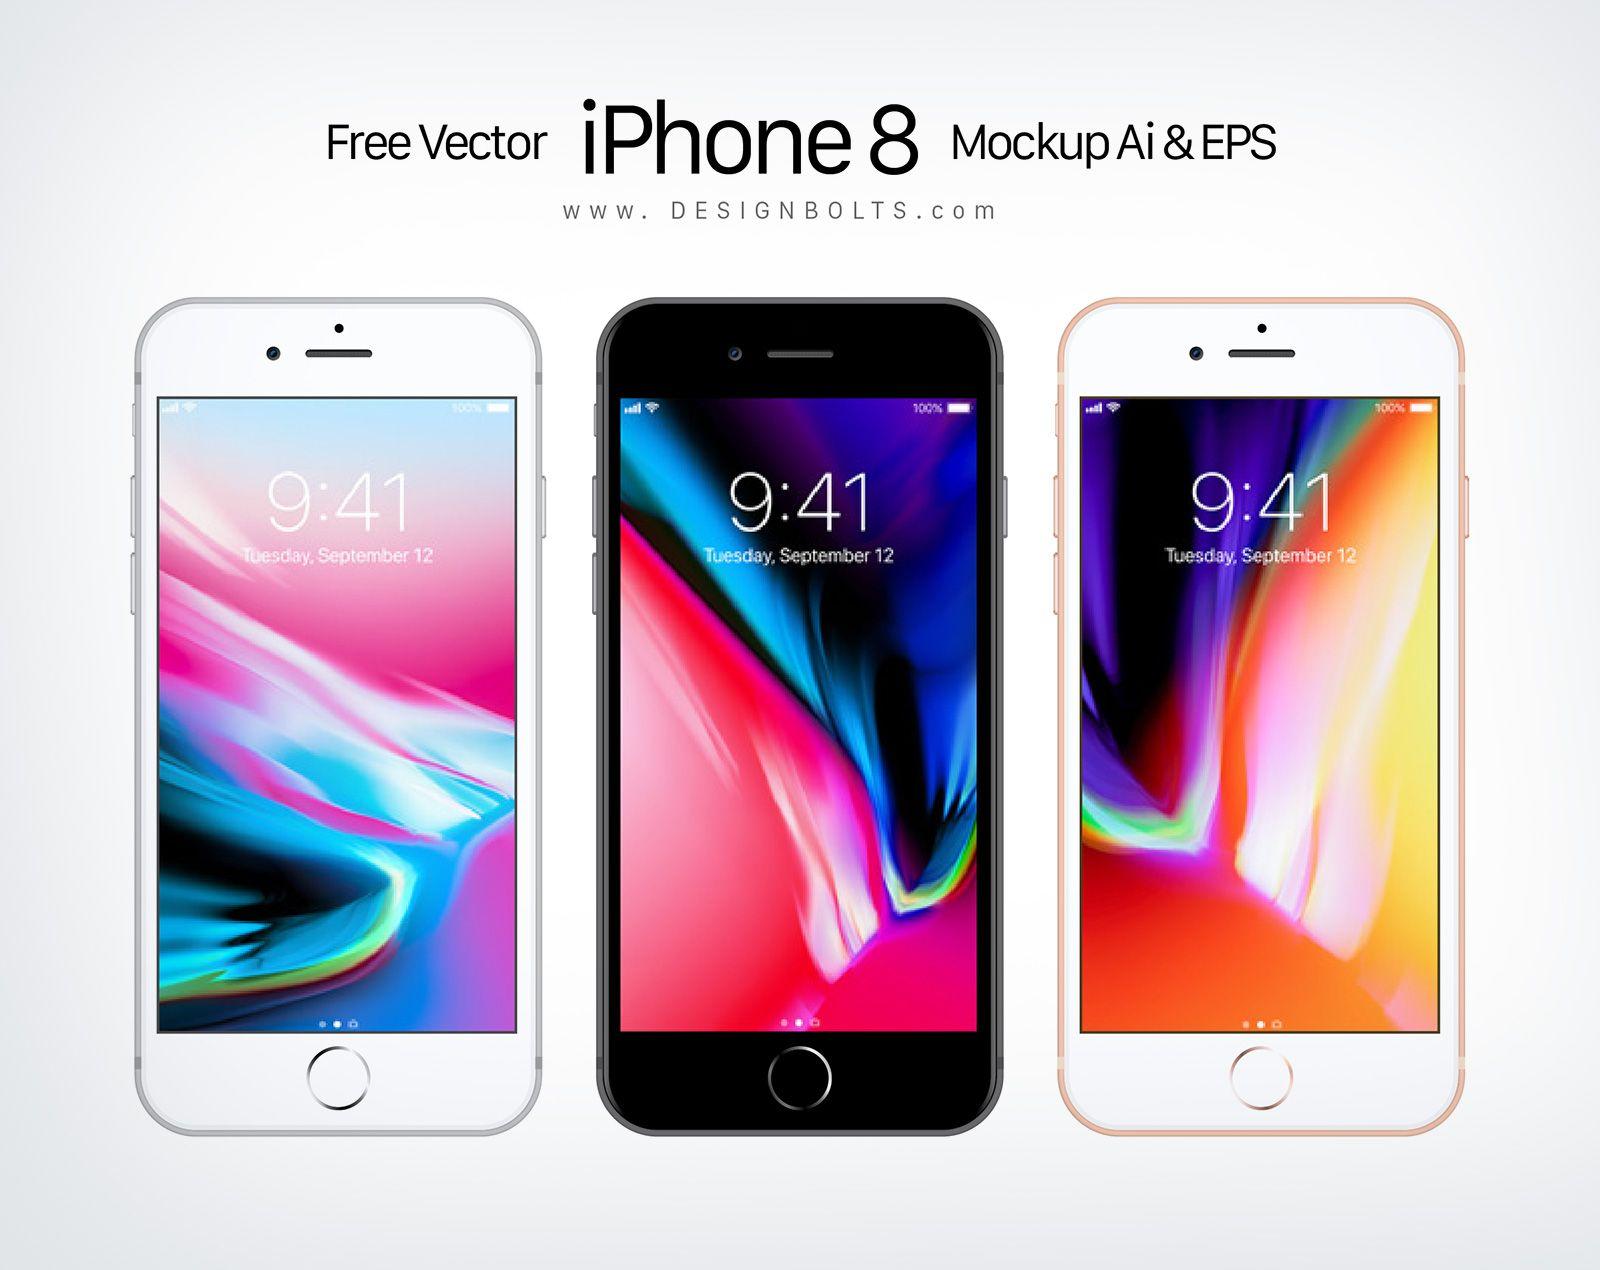 Download Free Vector Apple Iphone 8 Mockup Ai Eps Iphone Free Iphone Vector Free